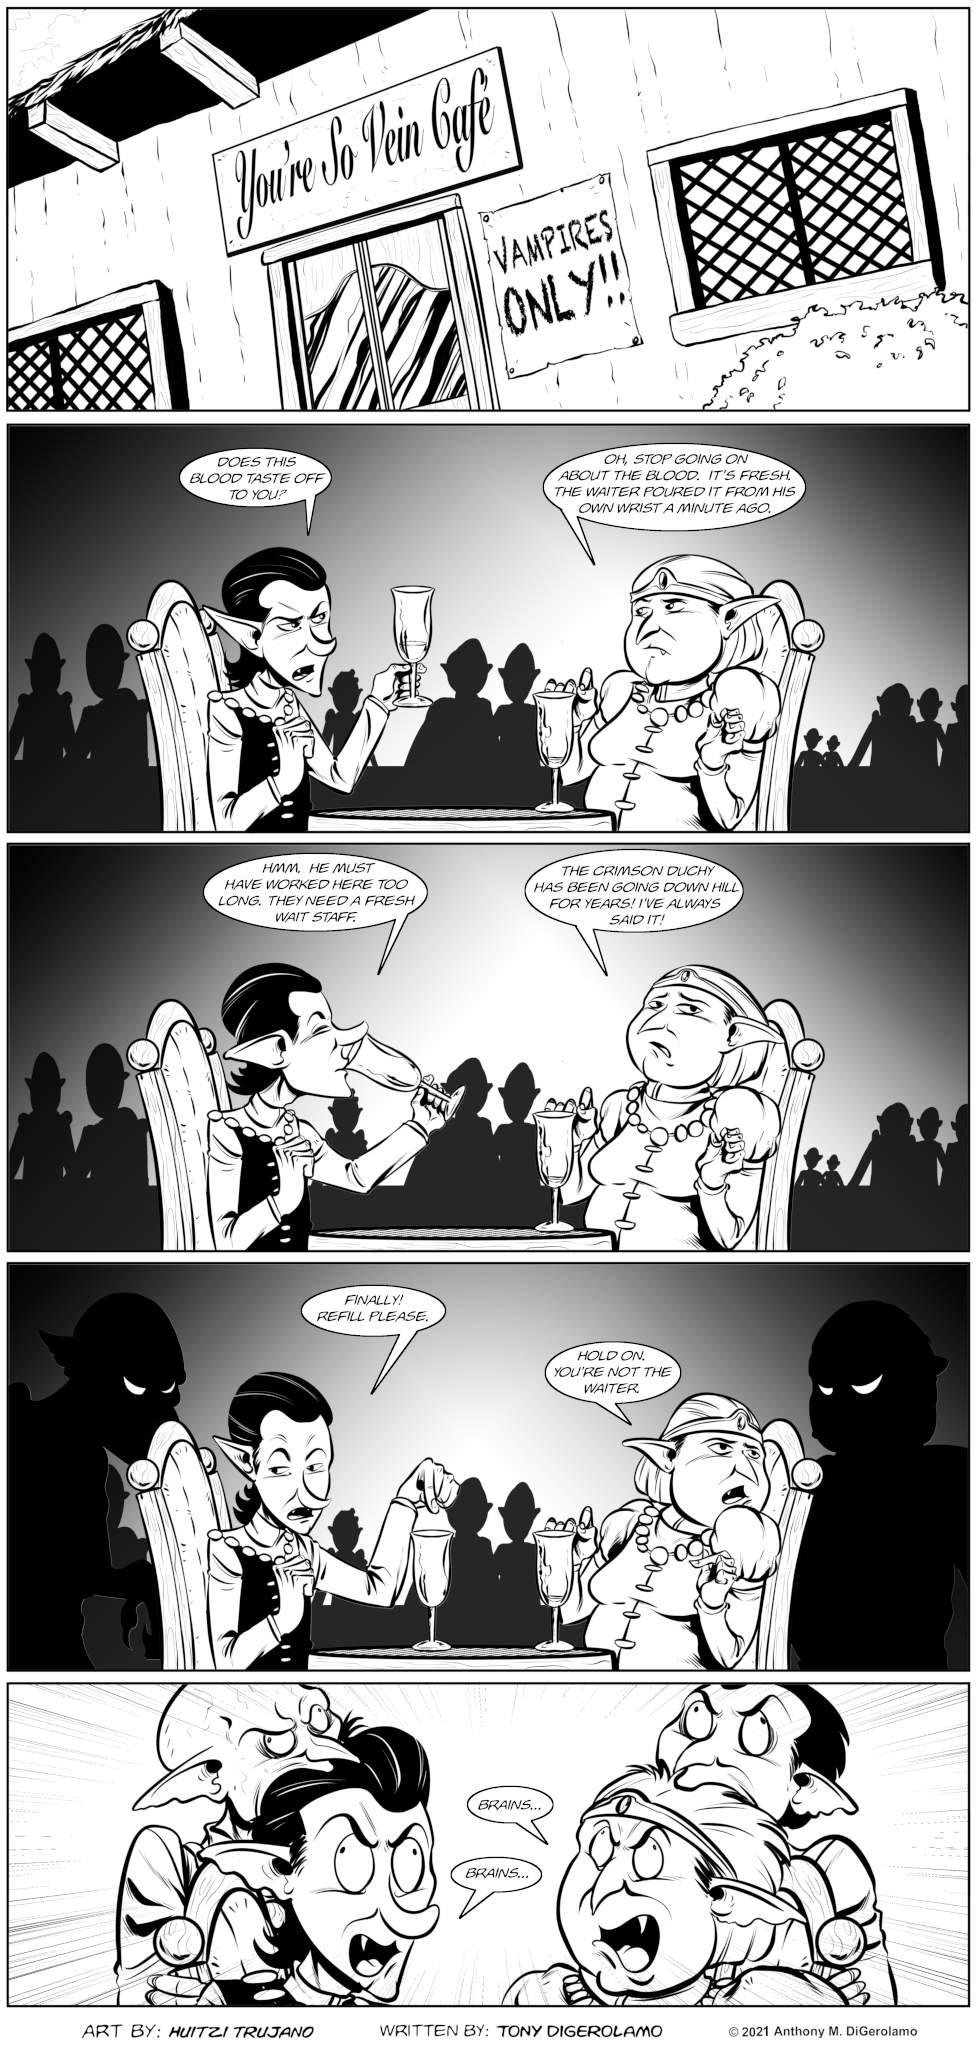 Pandamodium: You're Not the Waiter